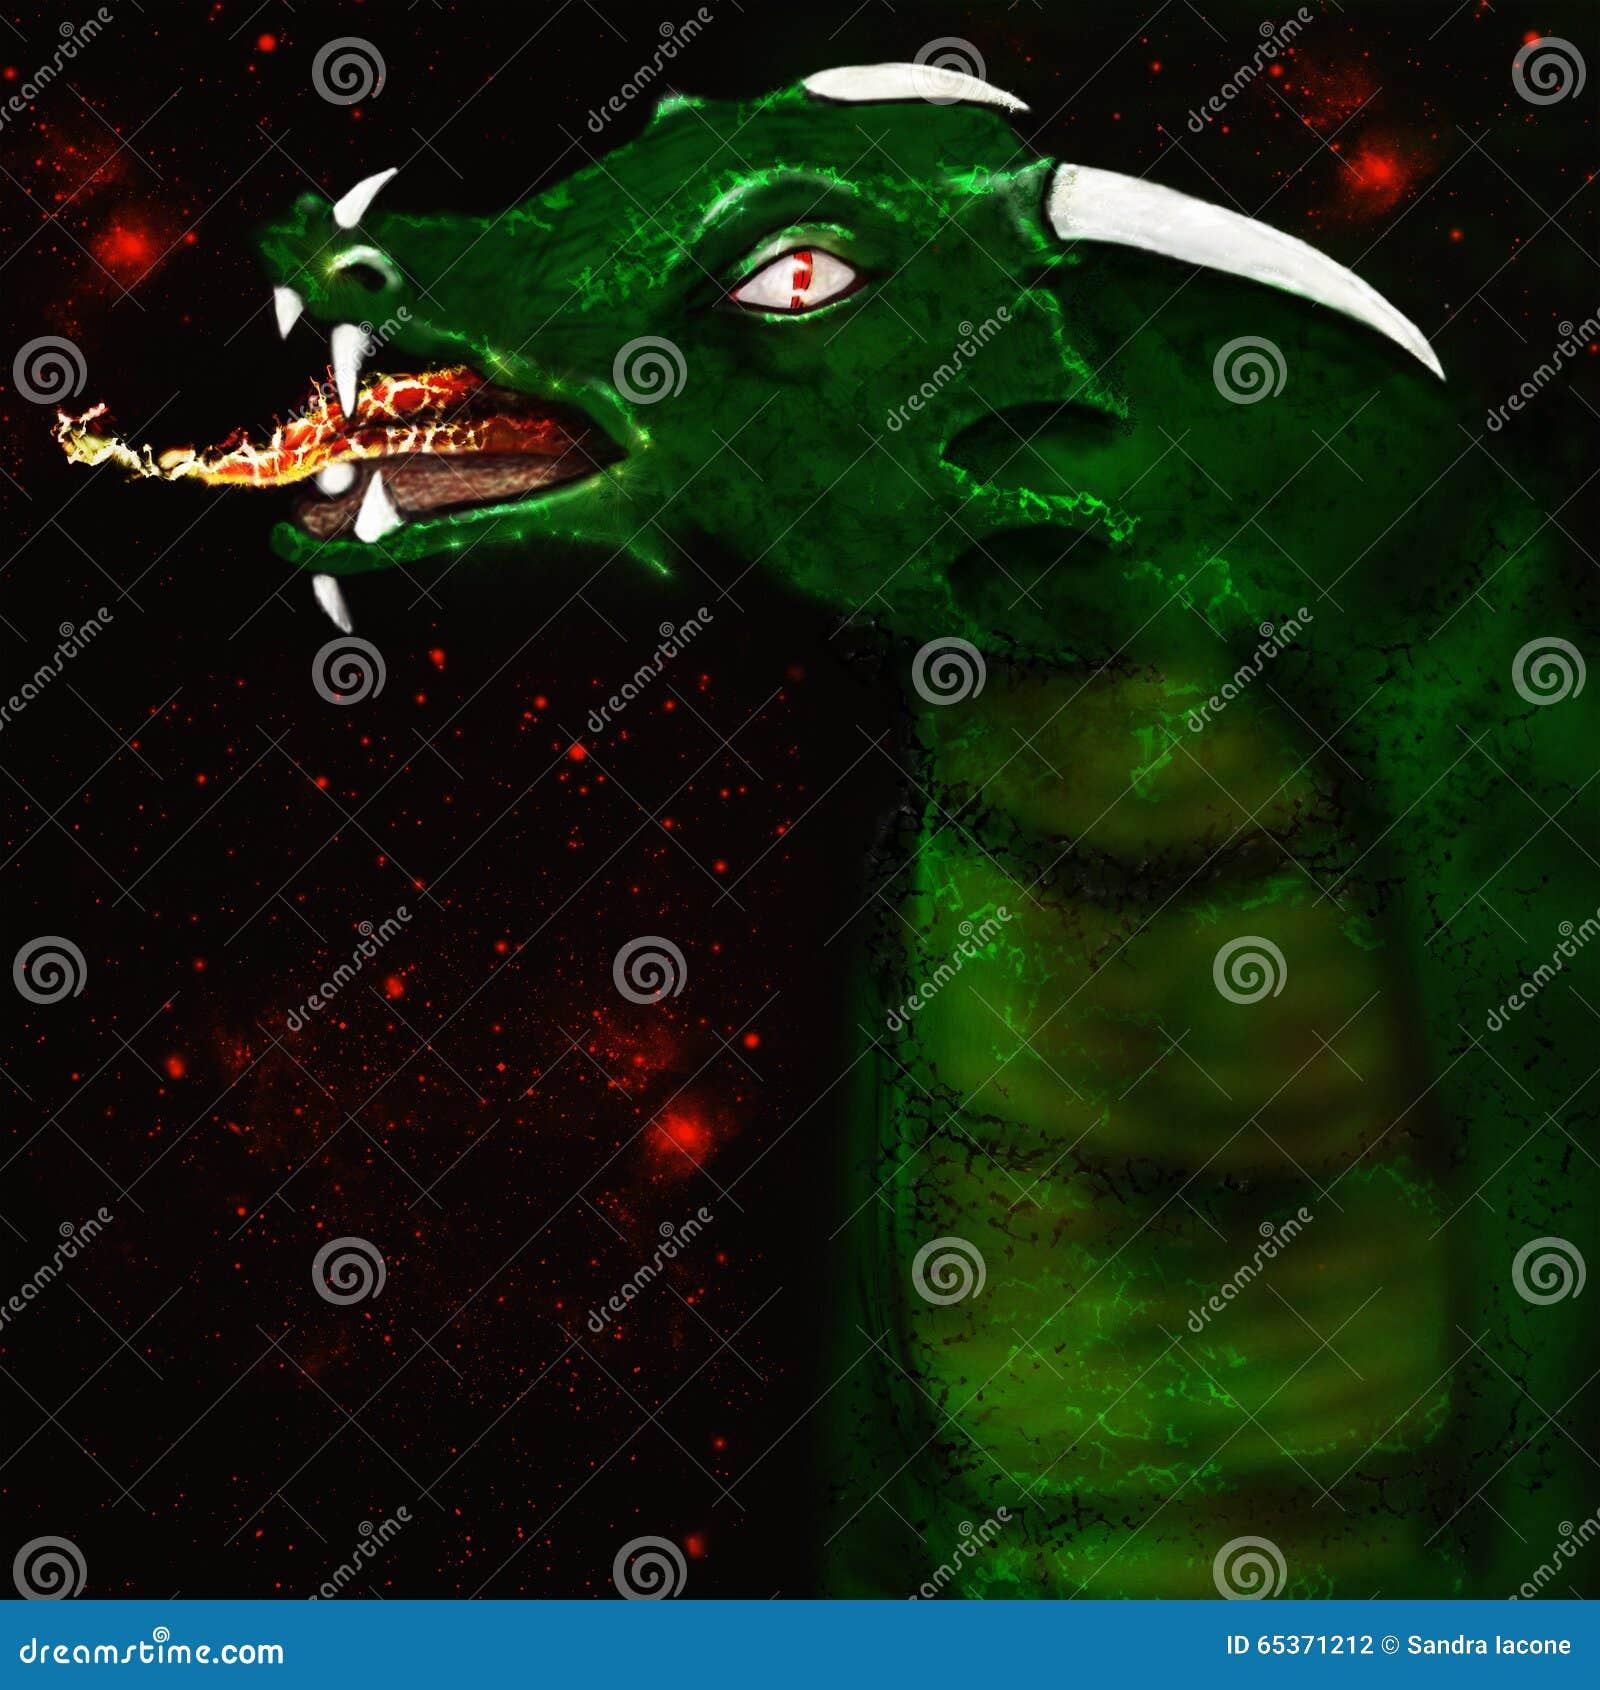 Illustrated green dragon